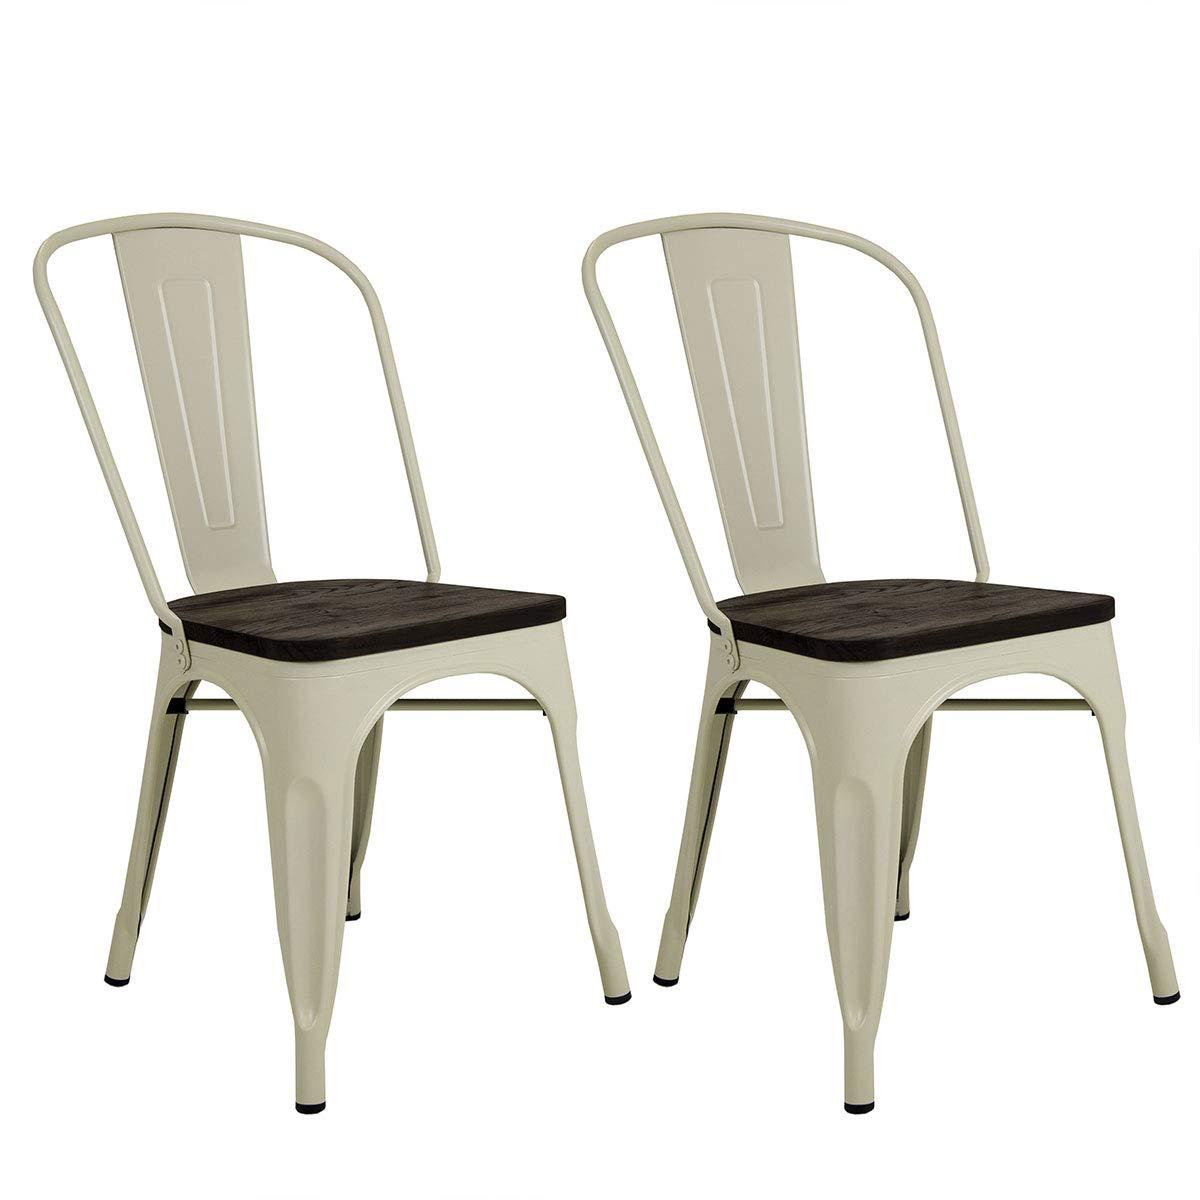 Charles Bentley Pair of 2 Steel Metal Industrial Wood Top Kitchen Dining Chairs